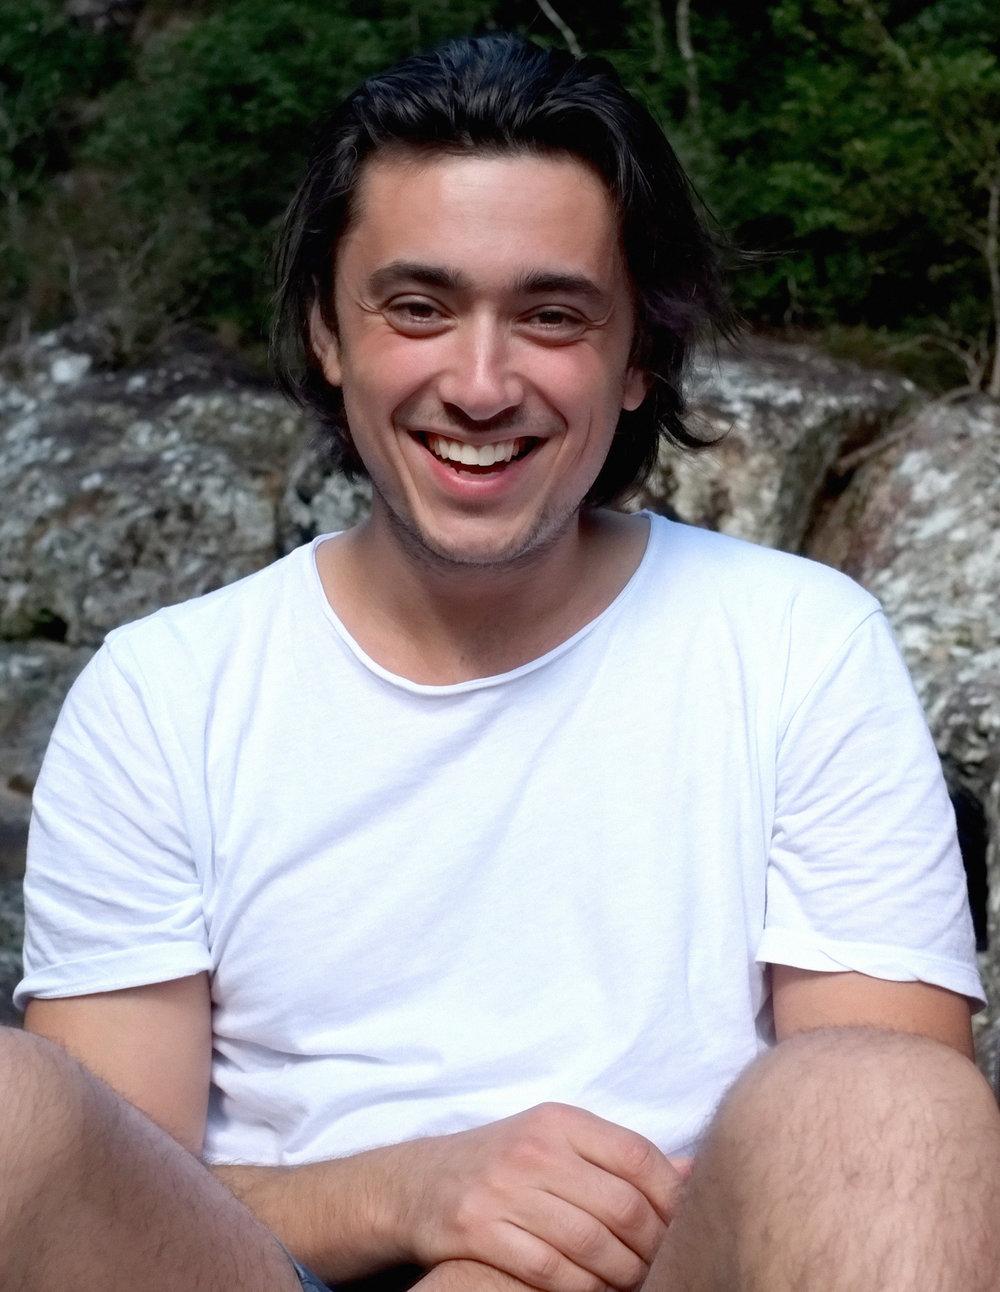 Igor Kreyman - Founder, the human connection movement